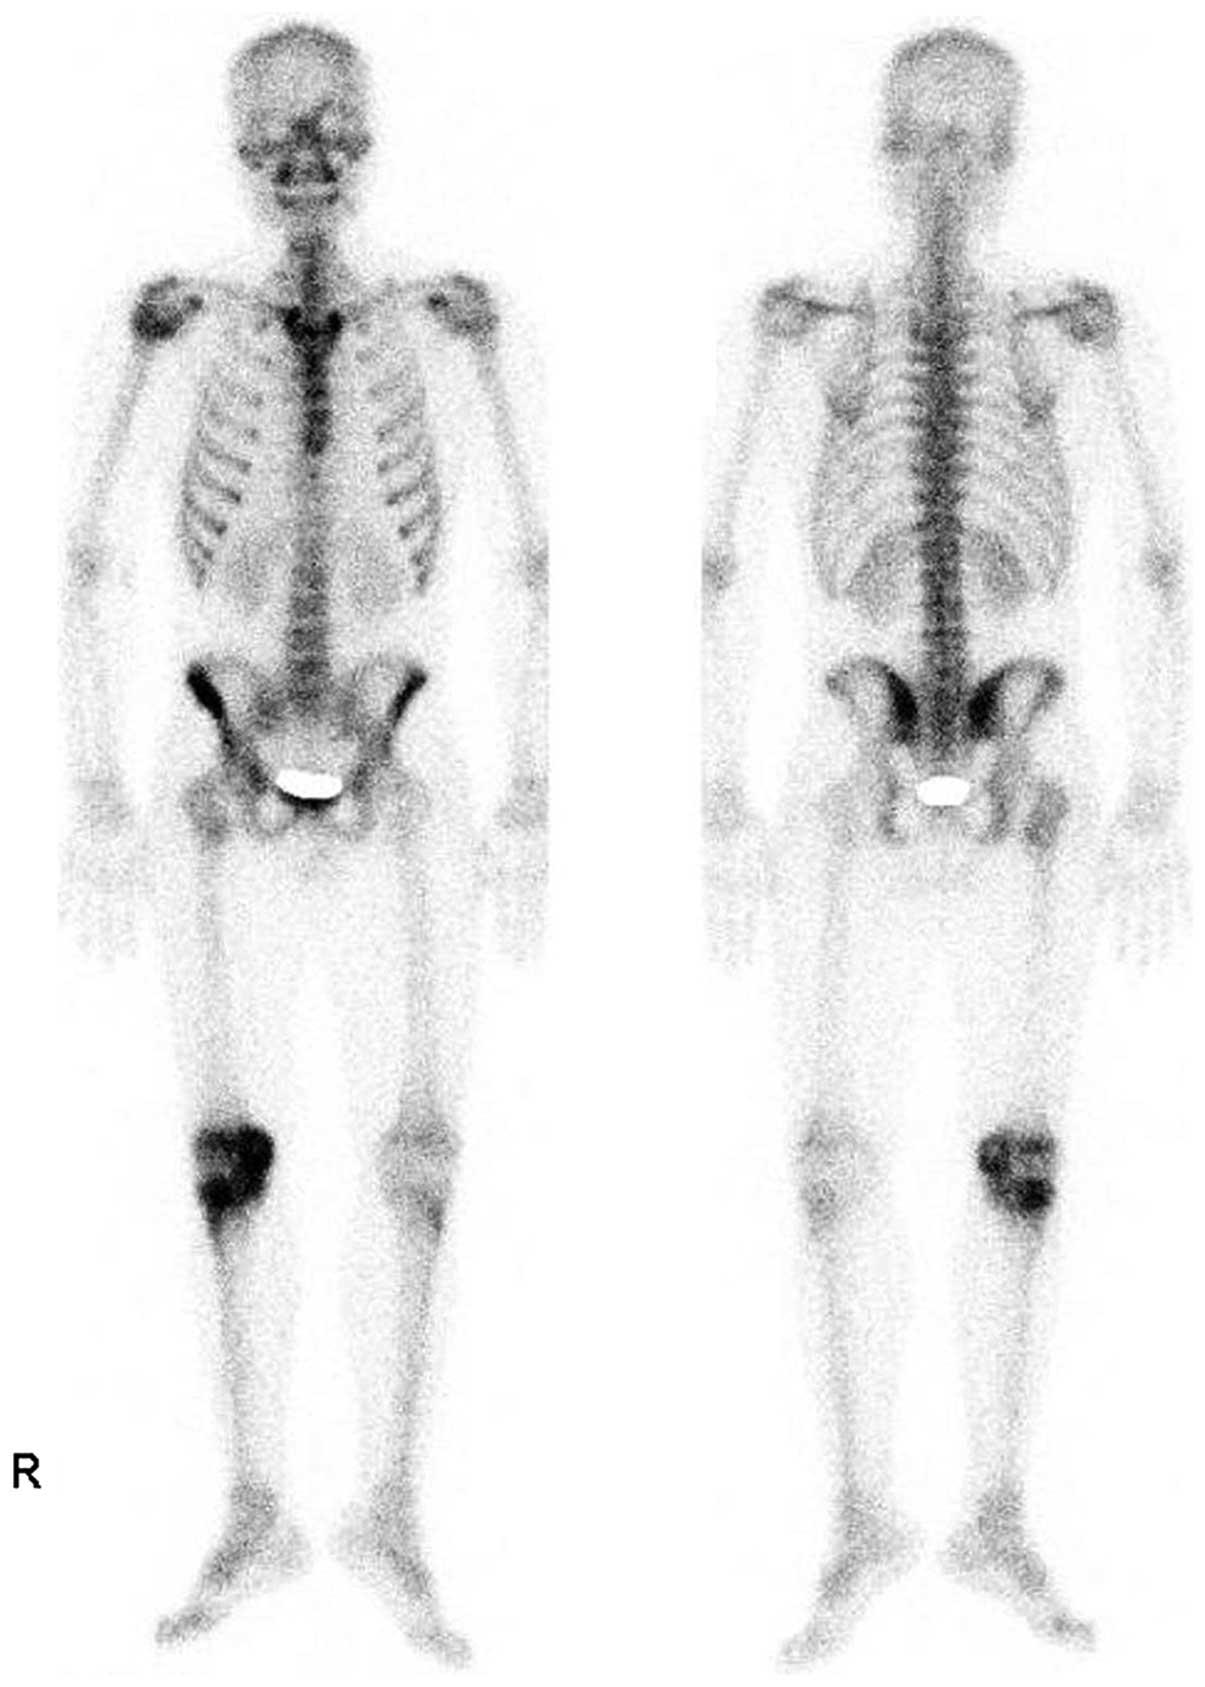 Bone Multicentric Epithelioid Hemangioendothelioma Of The Lower And